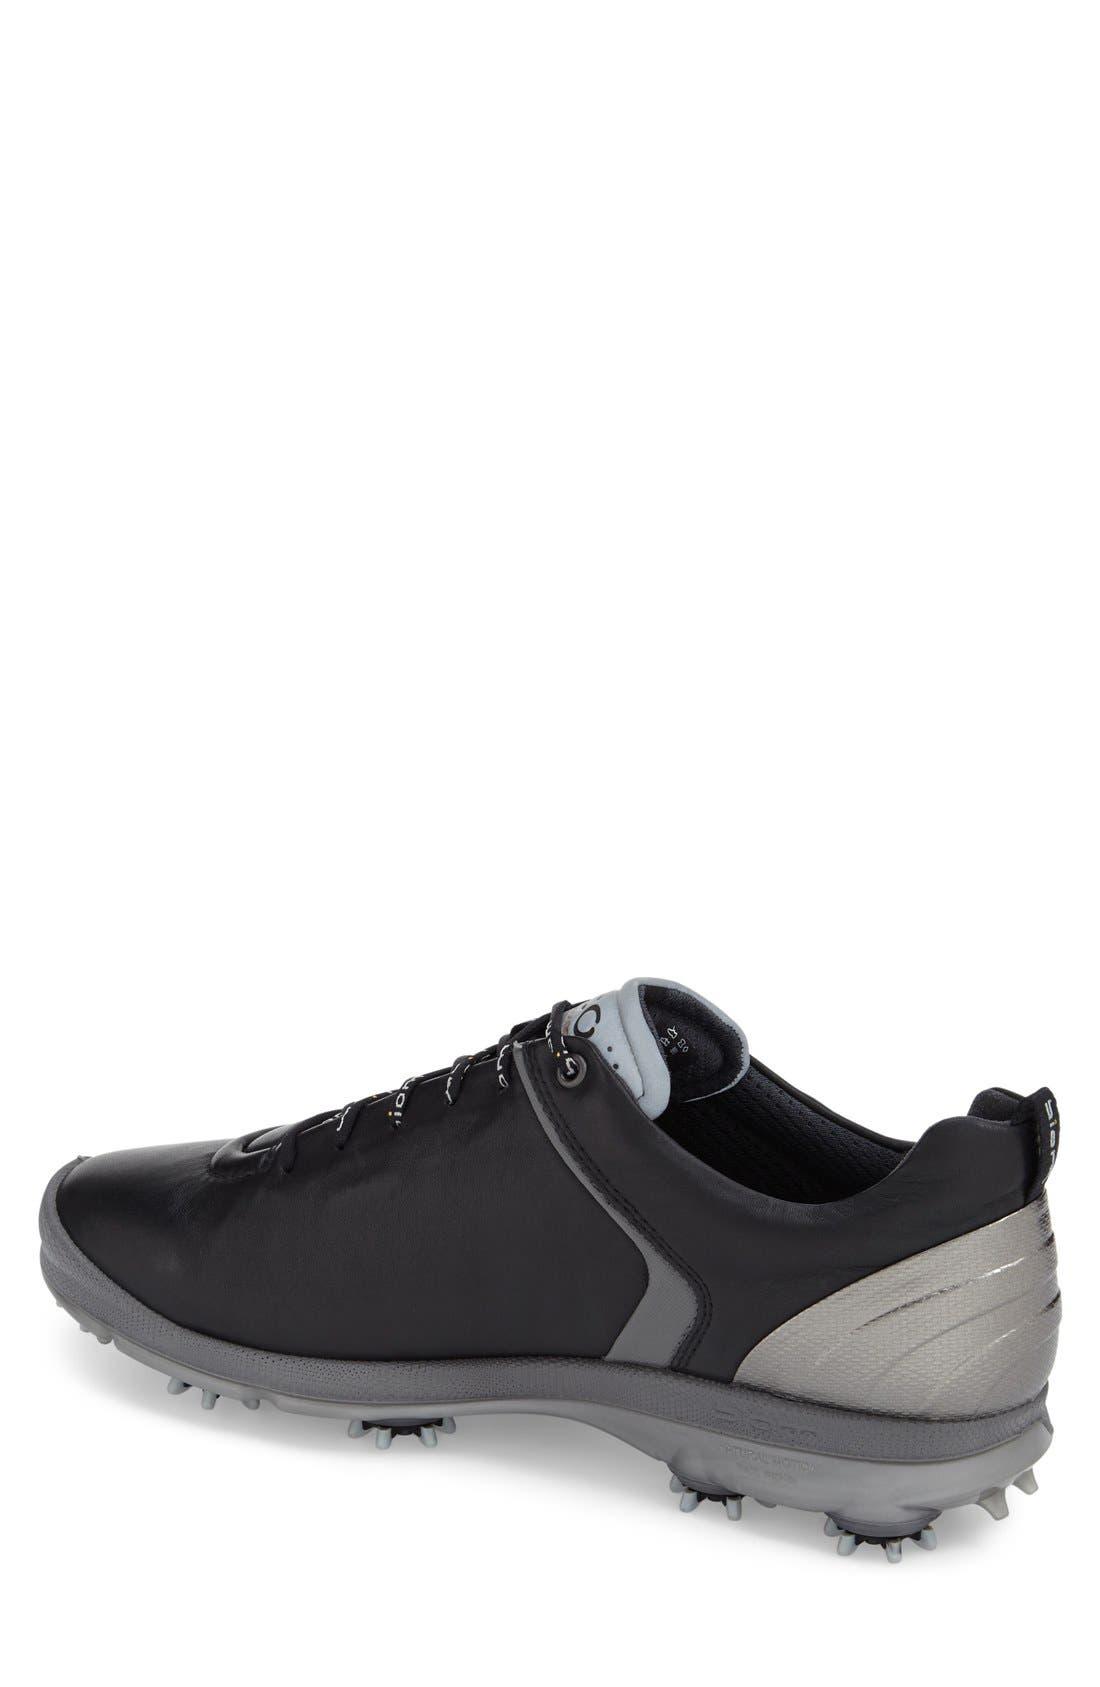 BIOM Hydromax Waterproof Golf Shoe,                             Alternate thumbnail 2, color,                             Black/ Transparent